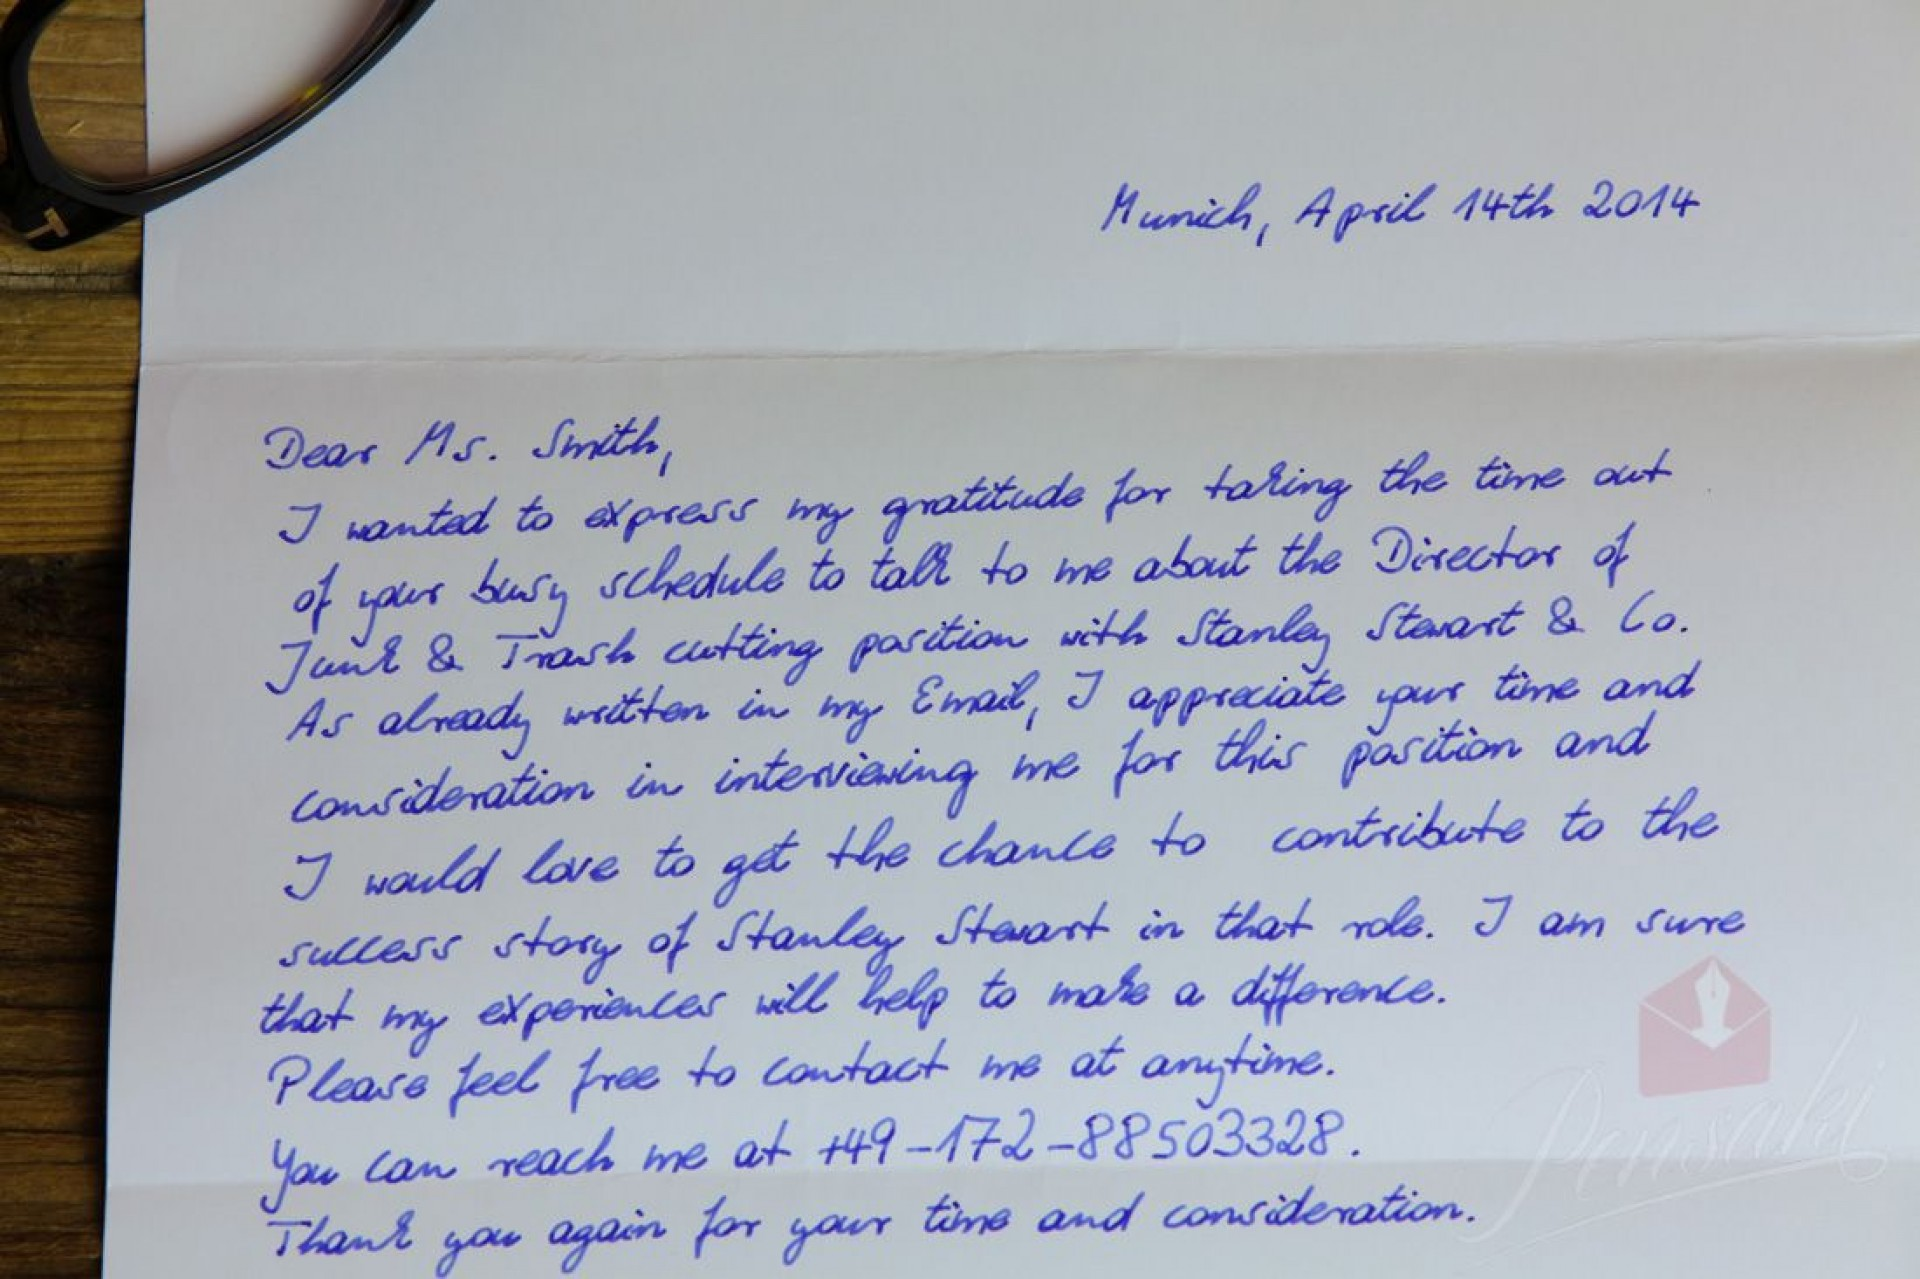 001 Impressive Handwritten Thank You Note After Interview Template High Resolution 1920